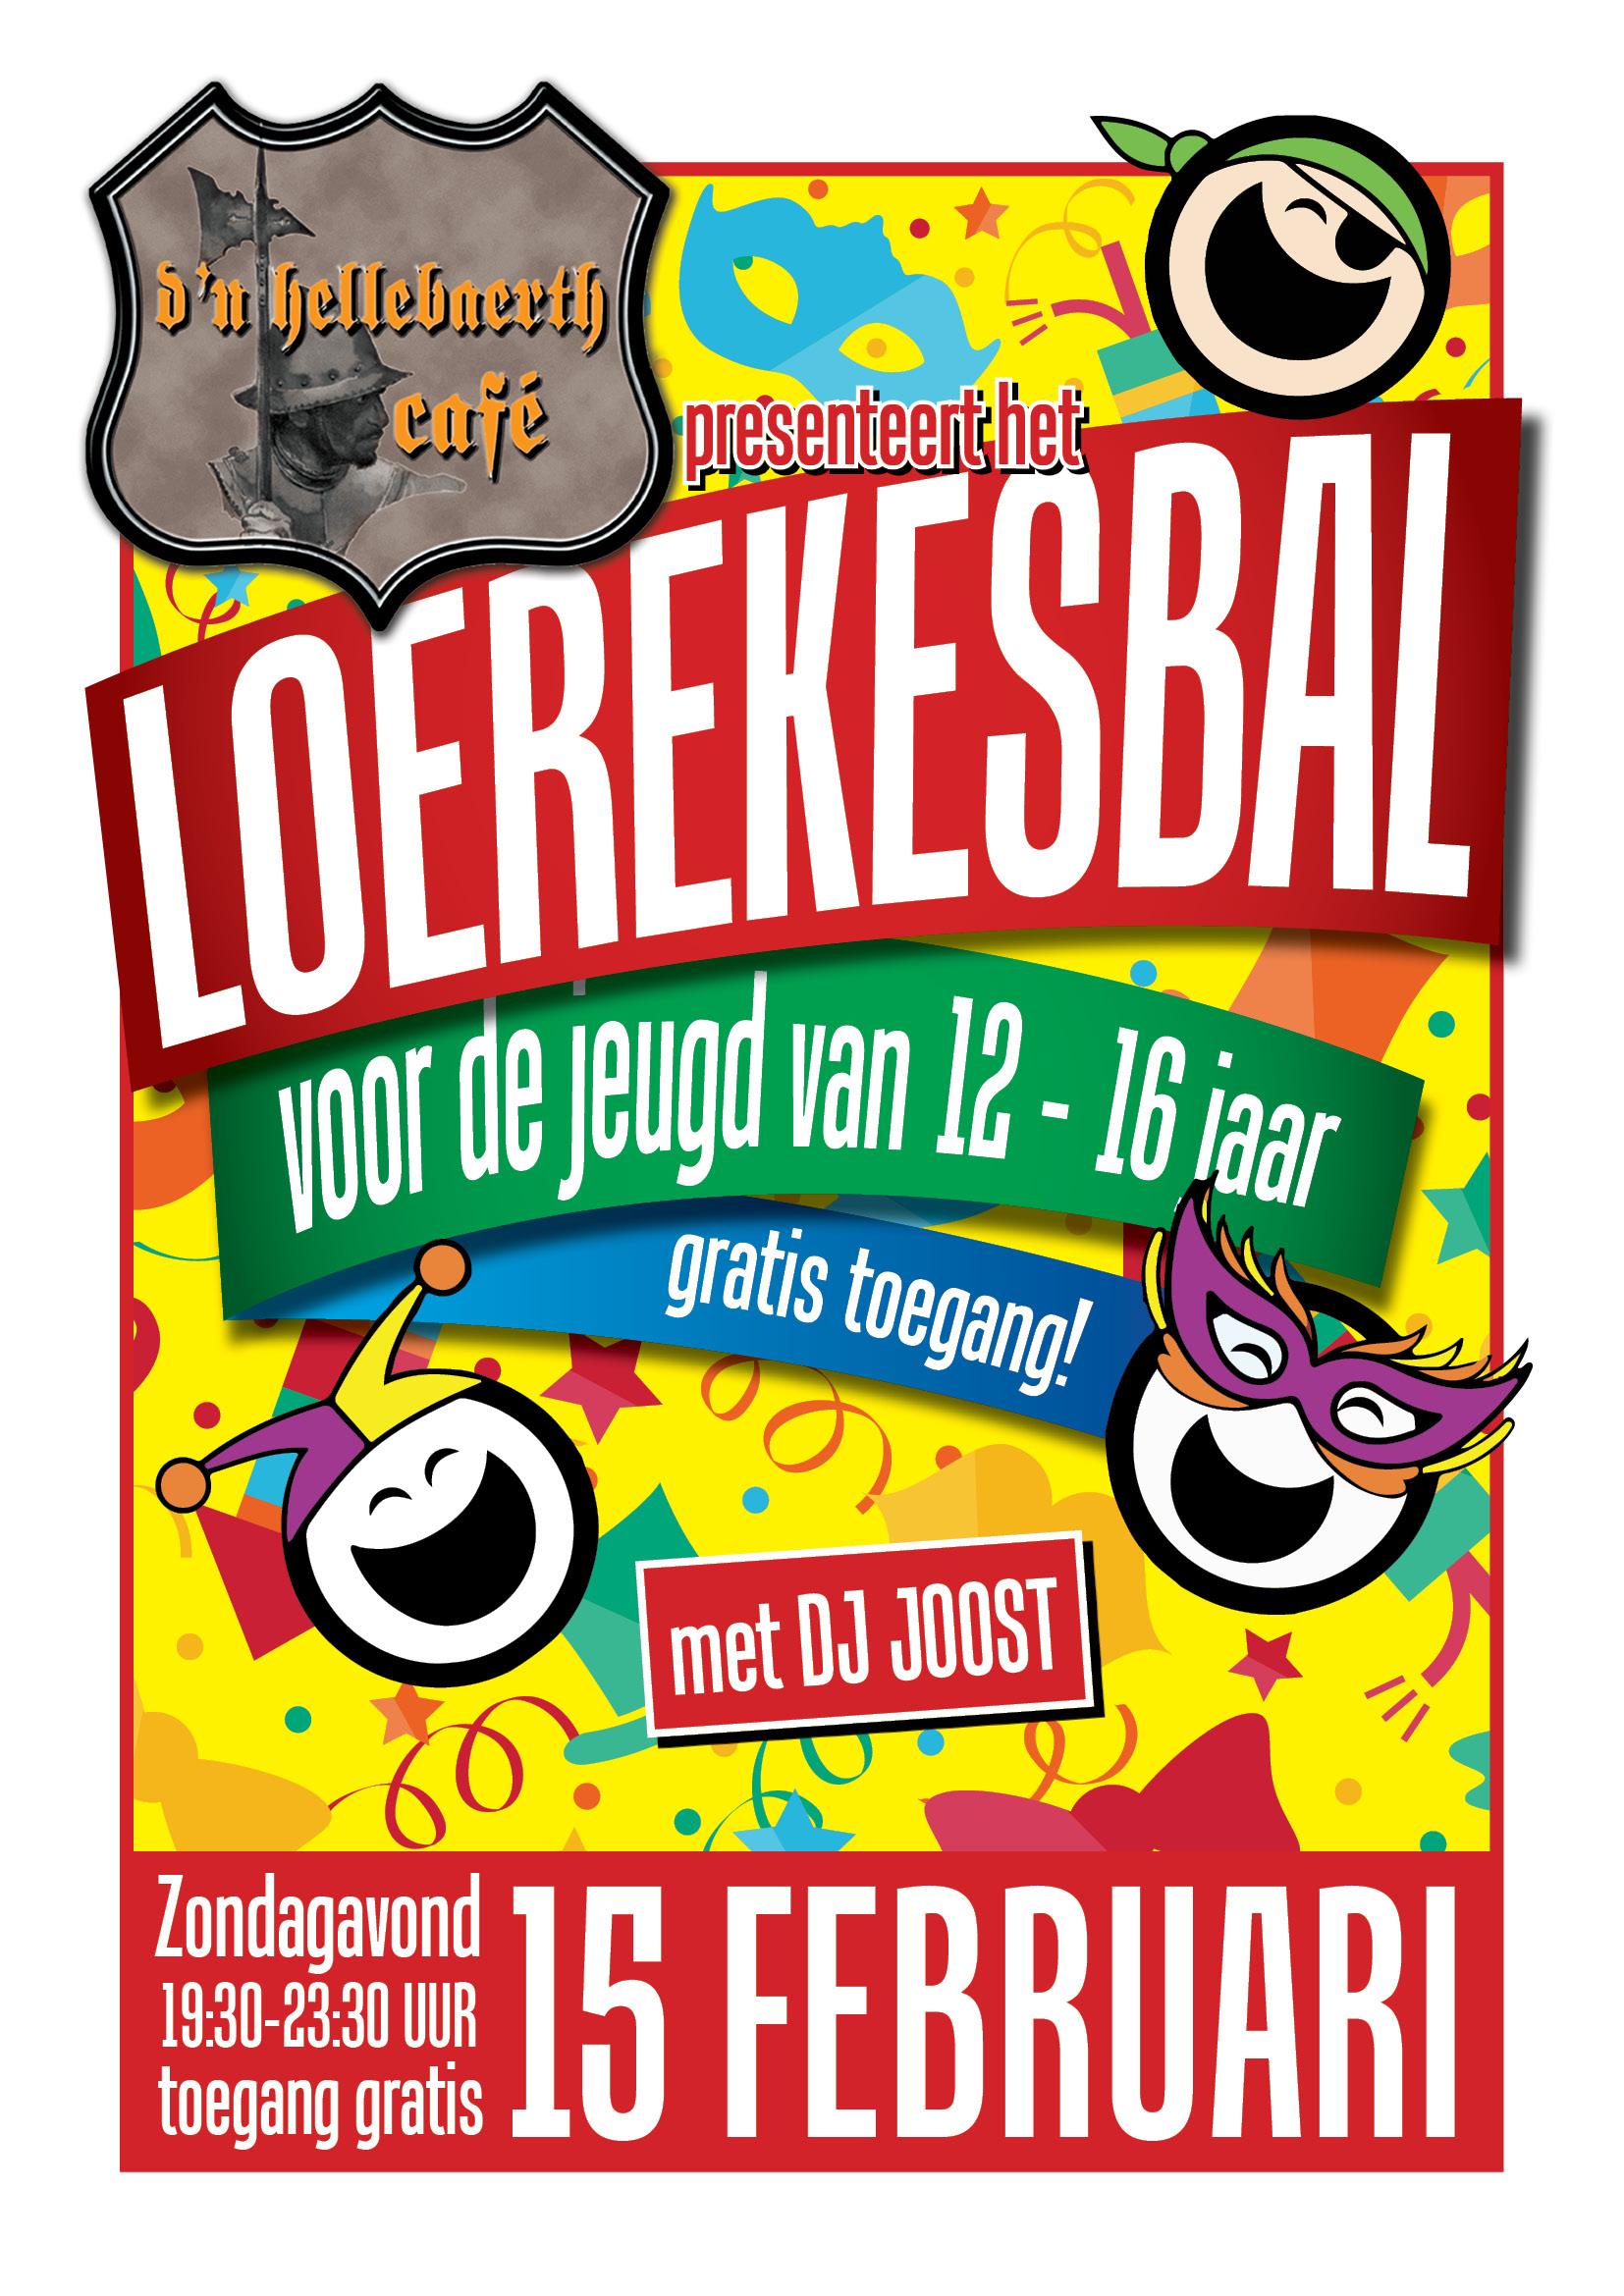 Loerekesbal op zondagavond – www.loerendonck.net Joetjoep